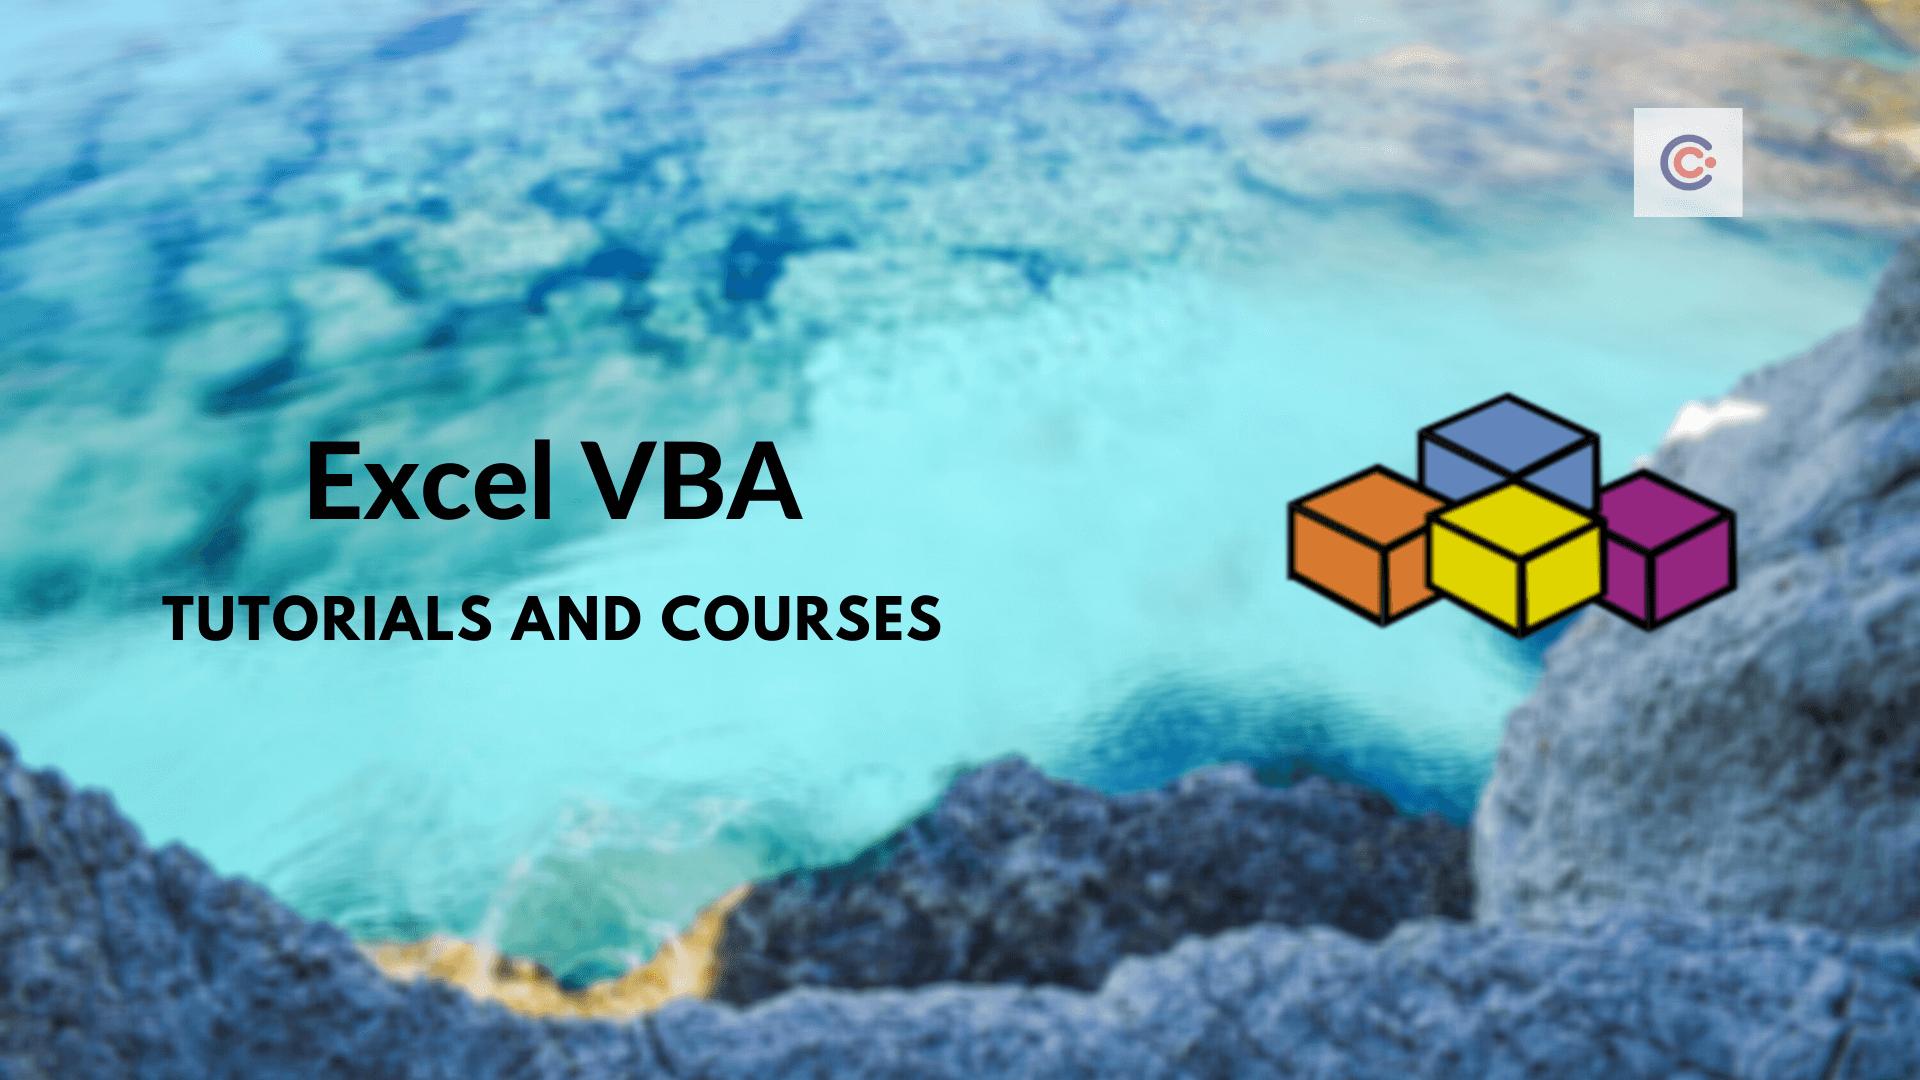 12 Best Excel VBA Tutorials & Courses - Learn Excel VBA Online